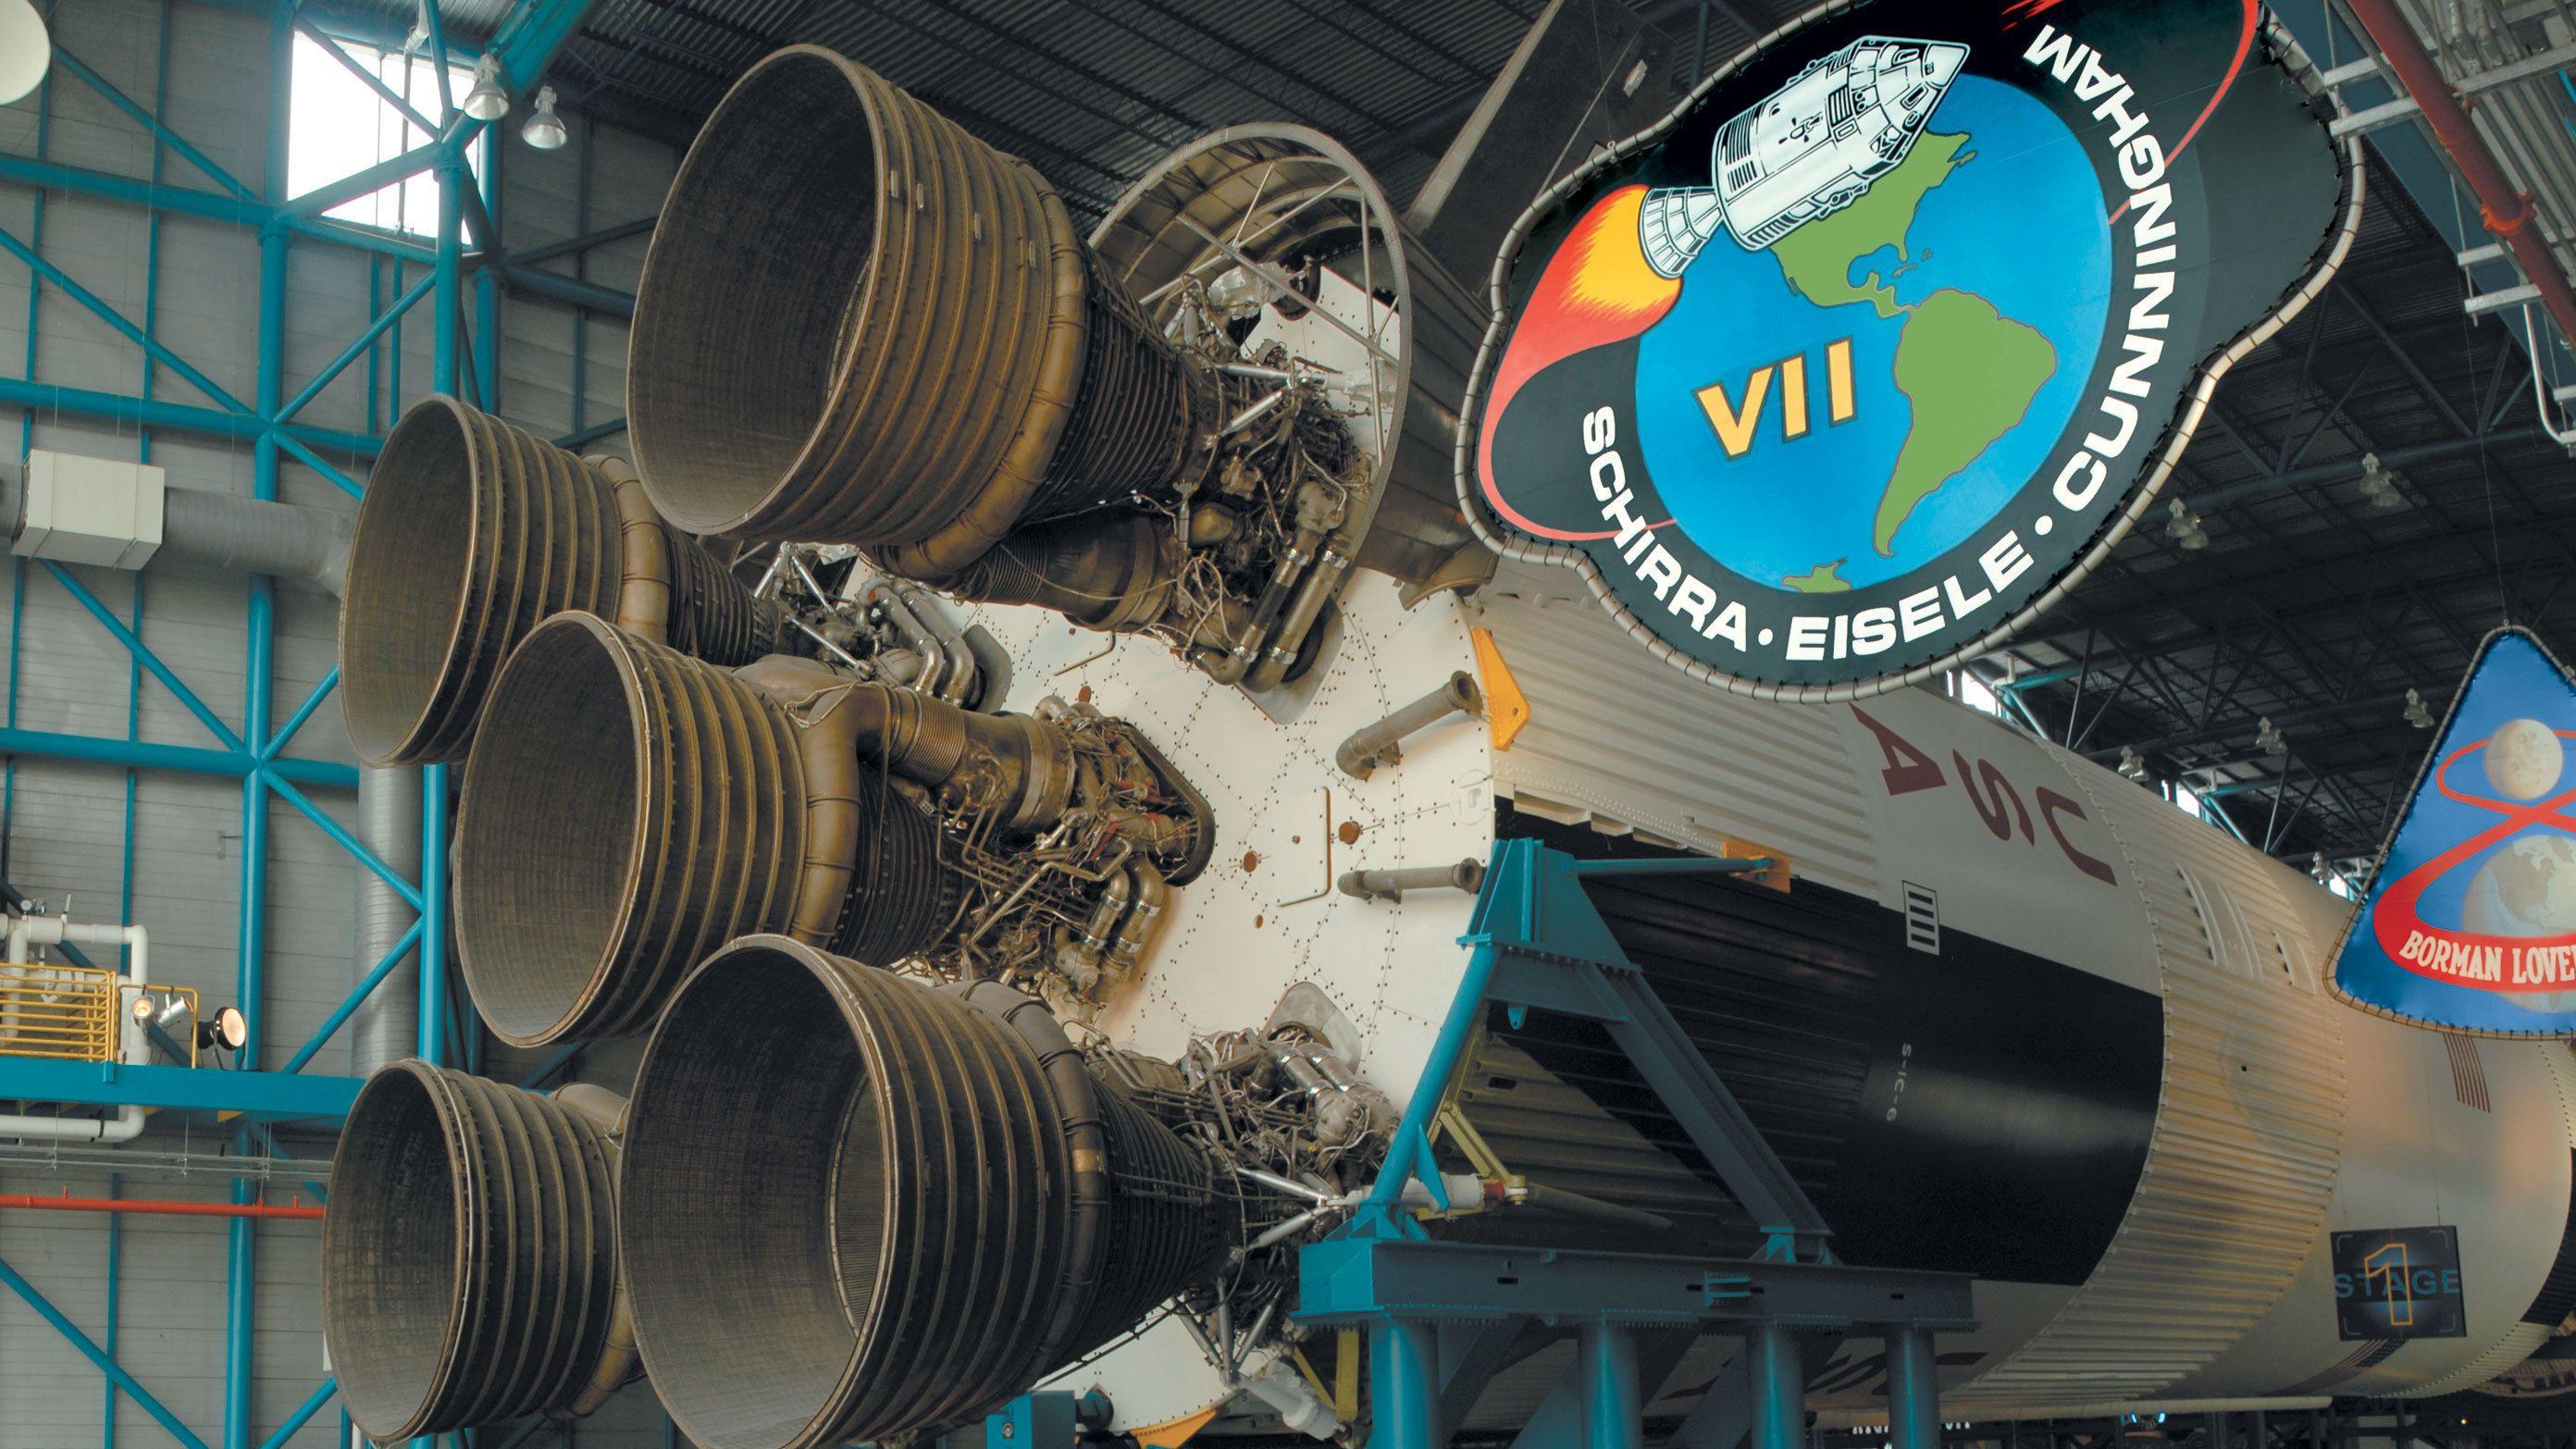 Apollo 7 exhibit at Kennedy Space Center in Orlando.